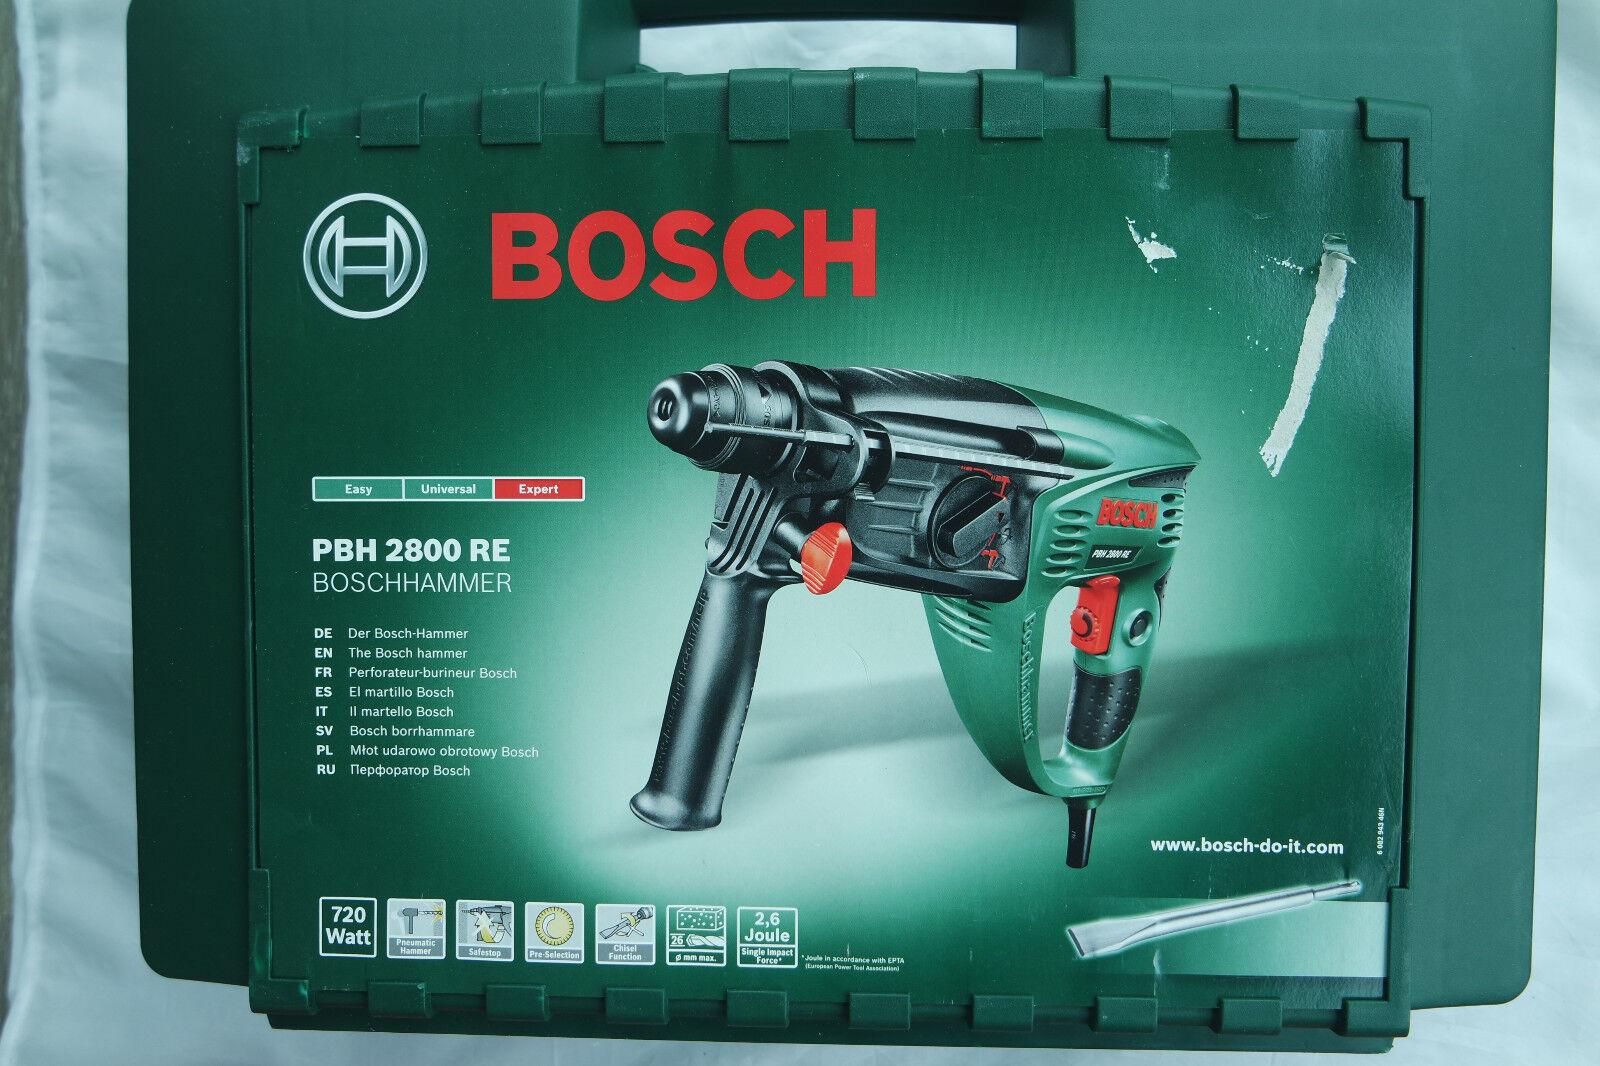 BOSCH 0603393000 PBH 2800 RE Bohrhammer